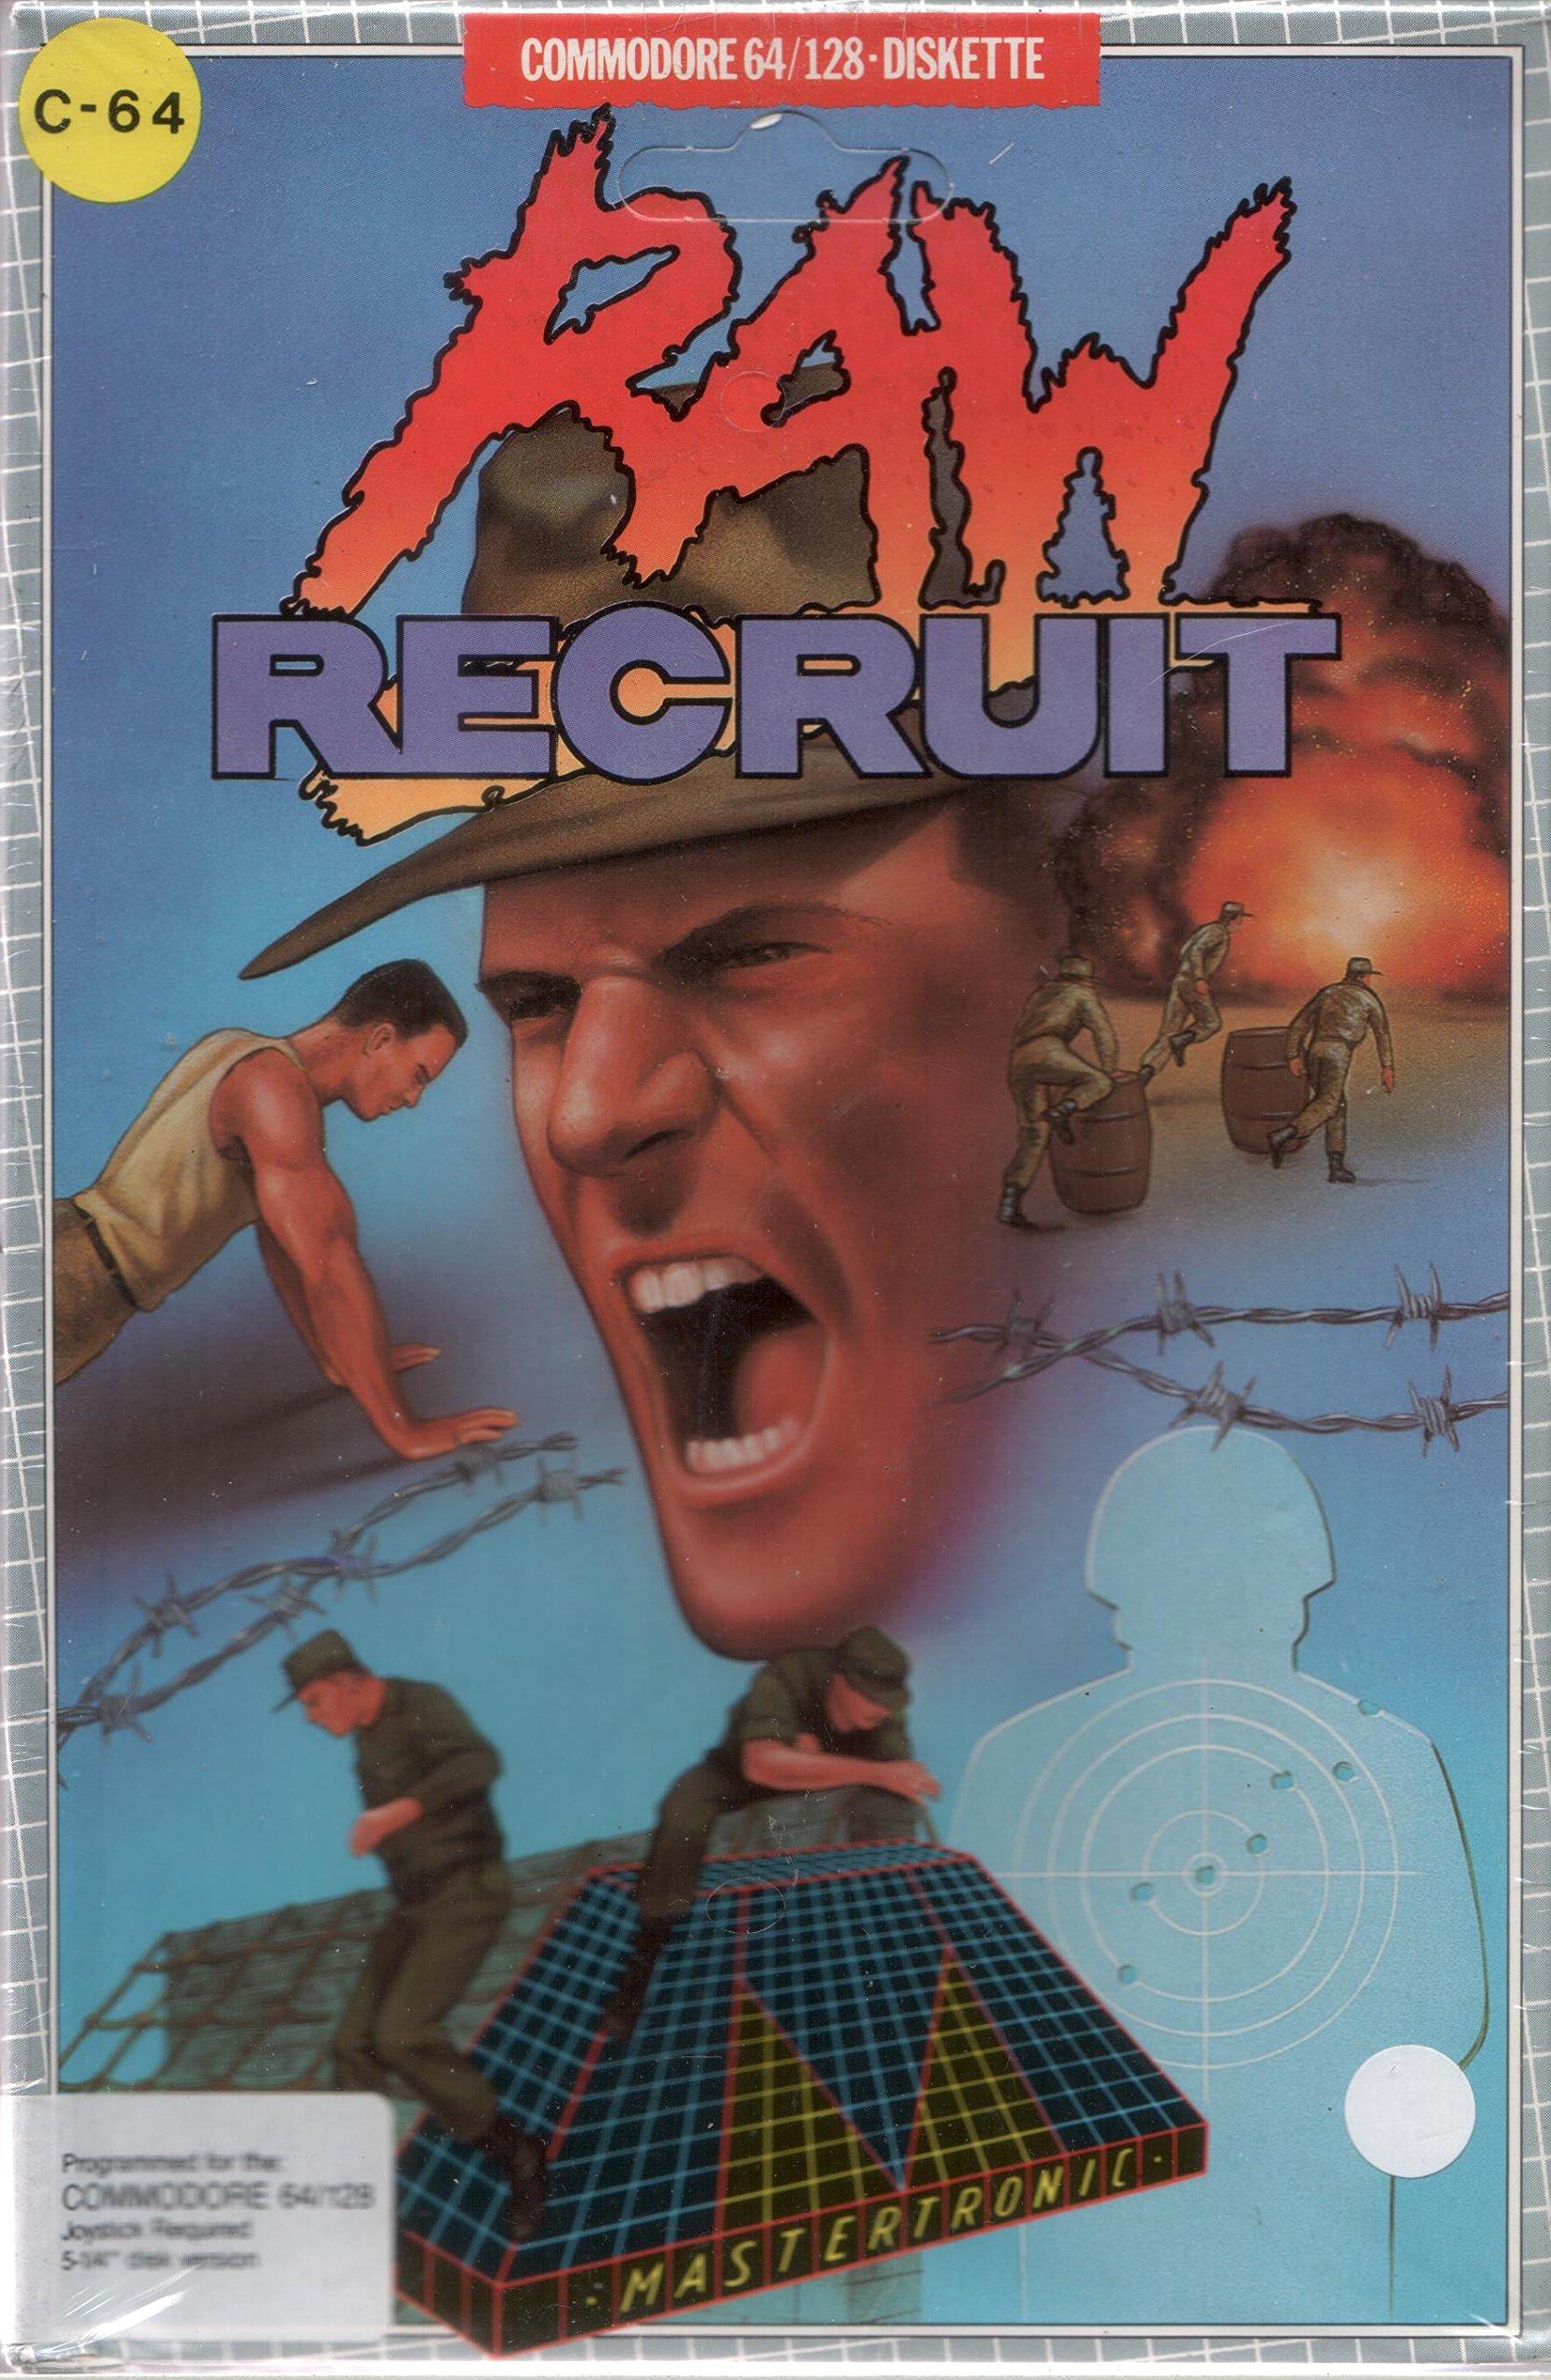 Raw Recruit - Commodore 64